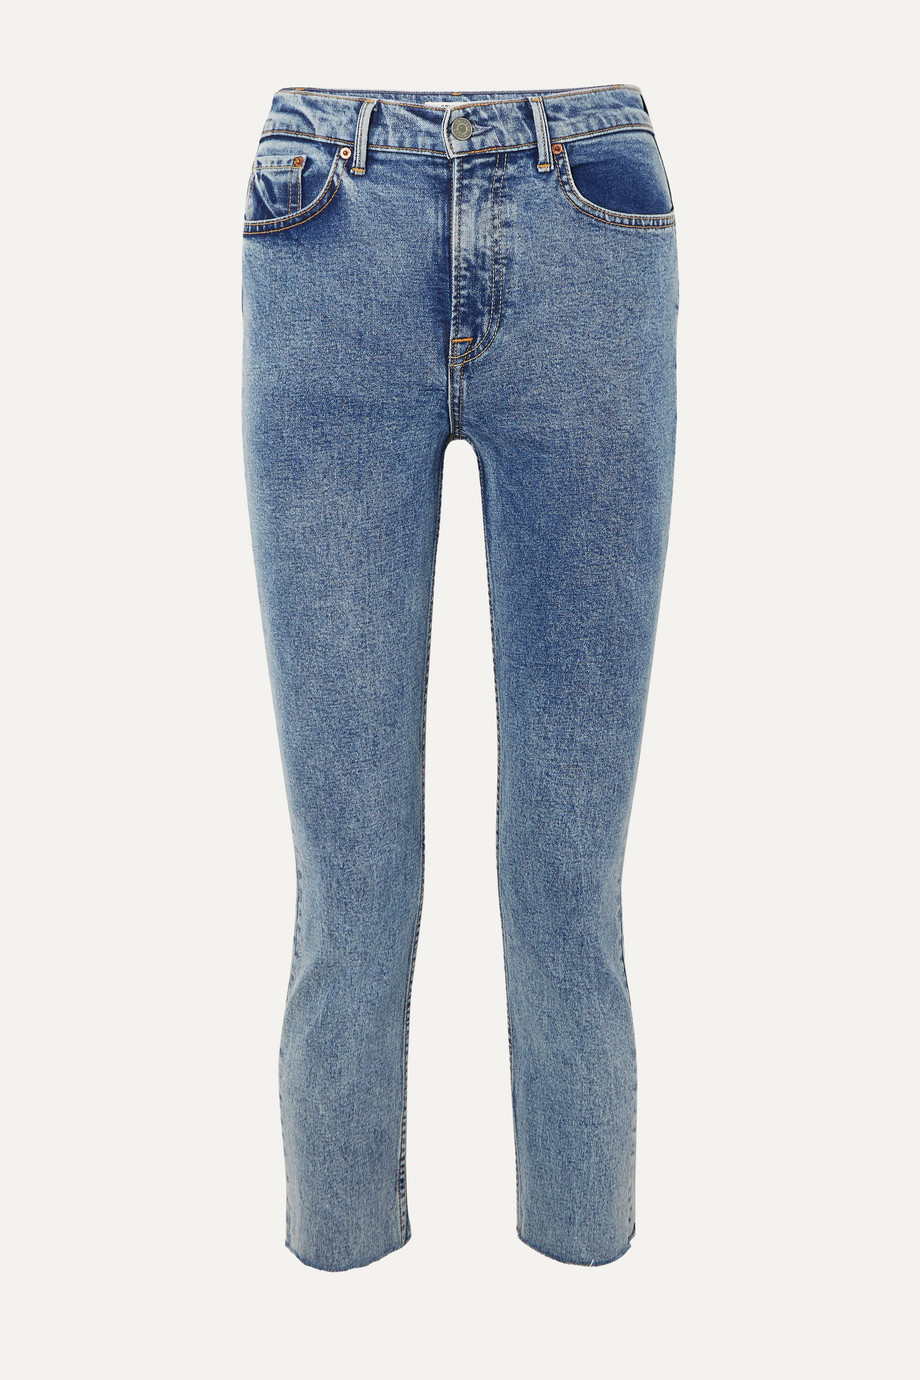 GRLFRND Reed cropped frayed acid-wash high-rise slim-leg jeans